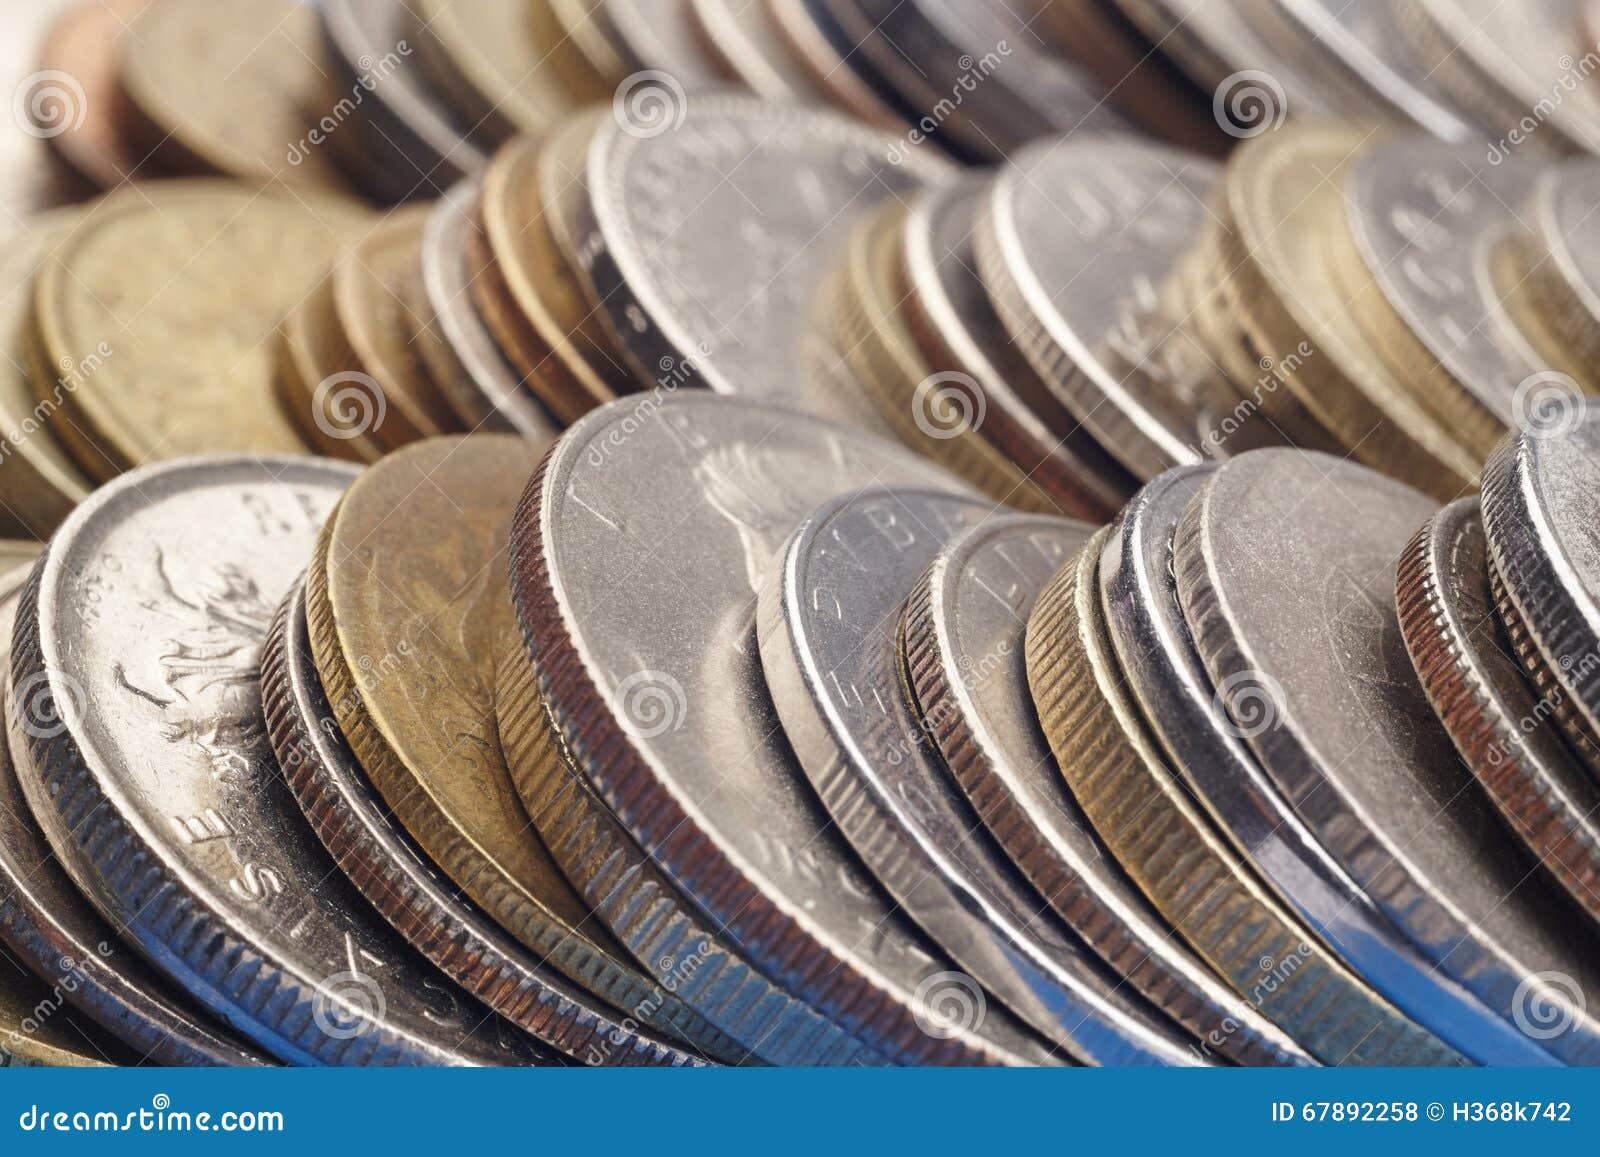 Diferentes tipos de monedas apiladas Detalle macro